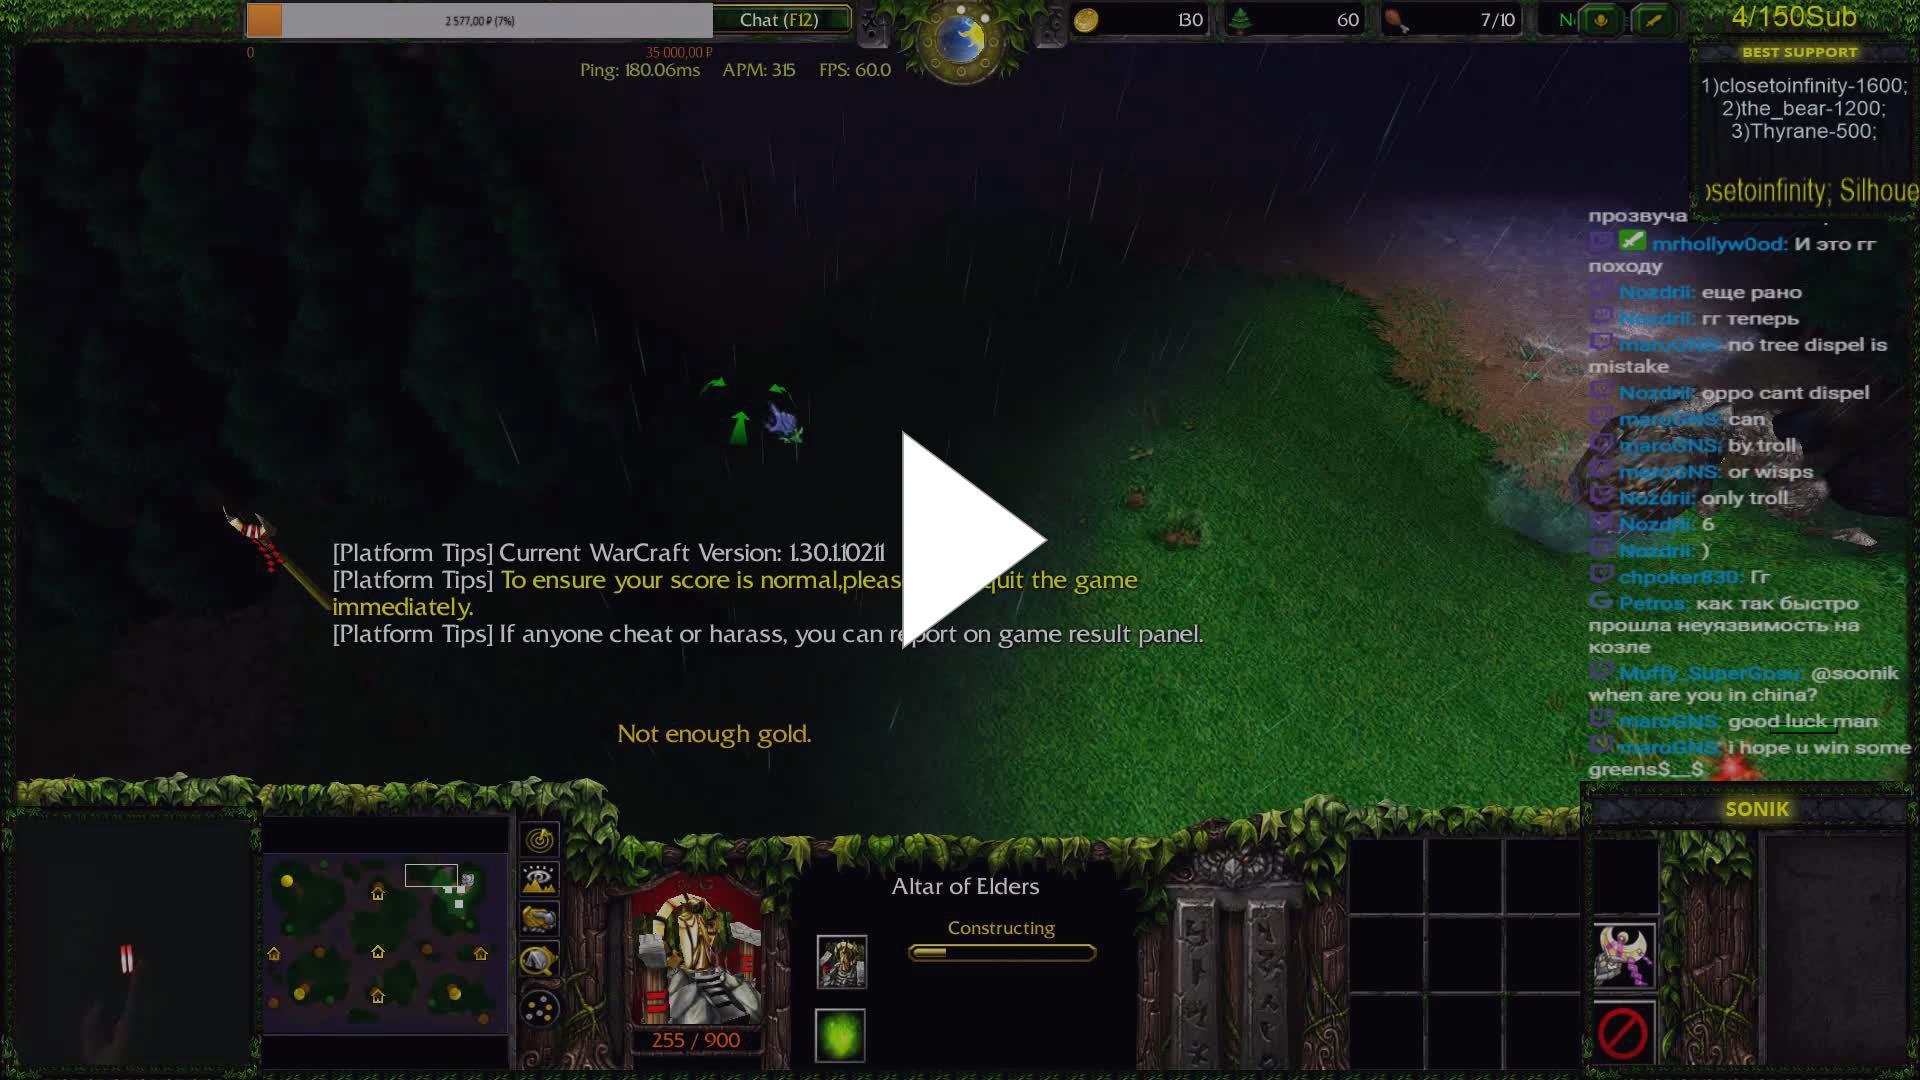 china power - Twitch